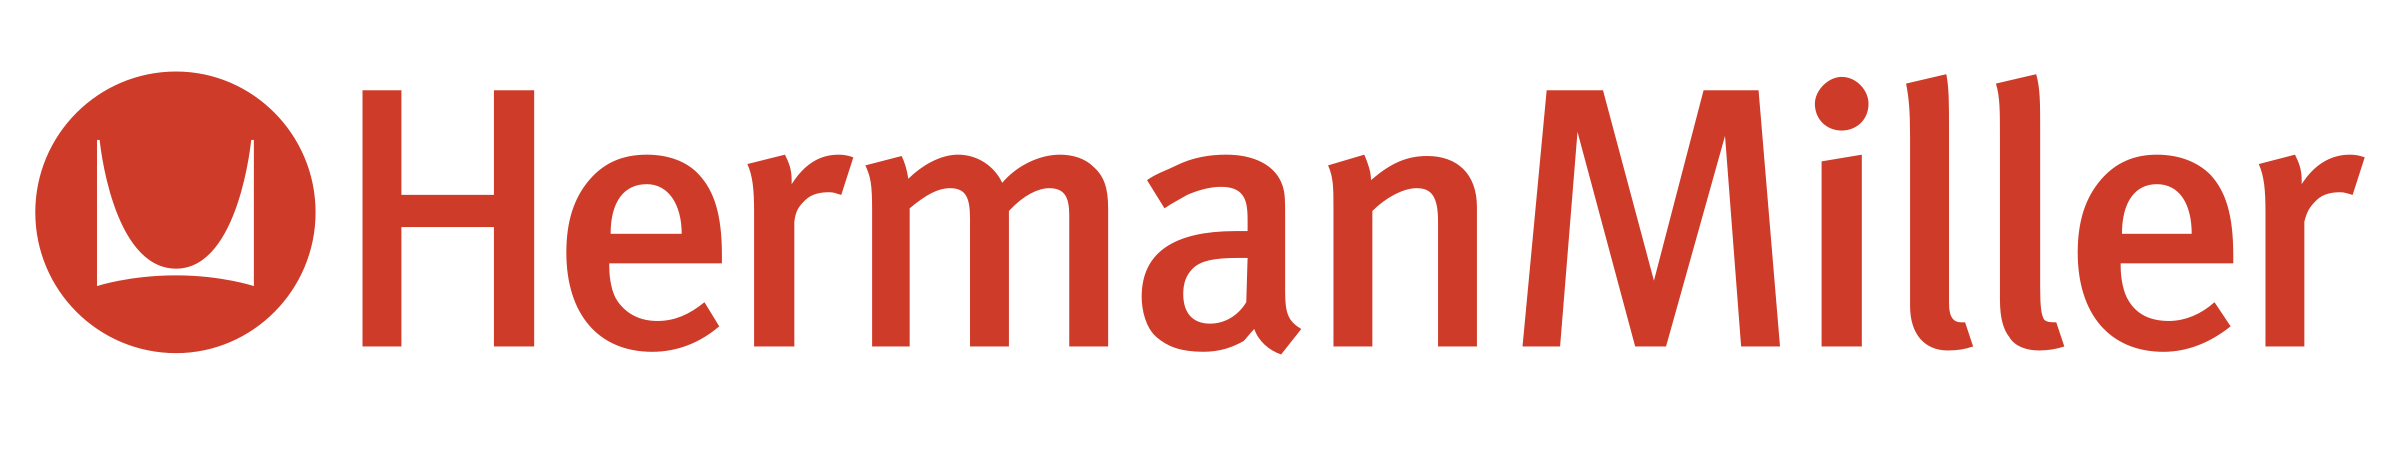 herman-miller-logo-png-transparent